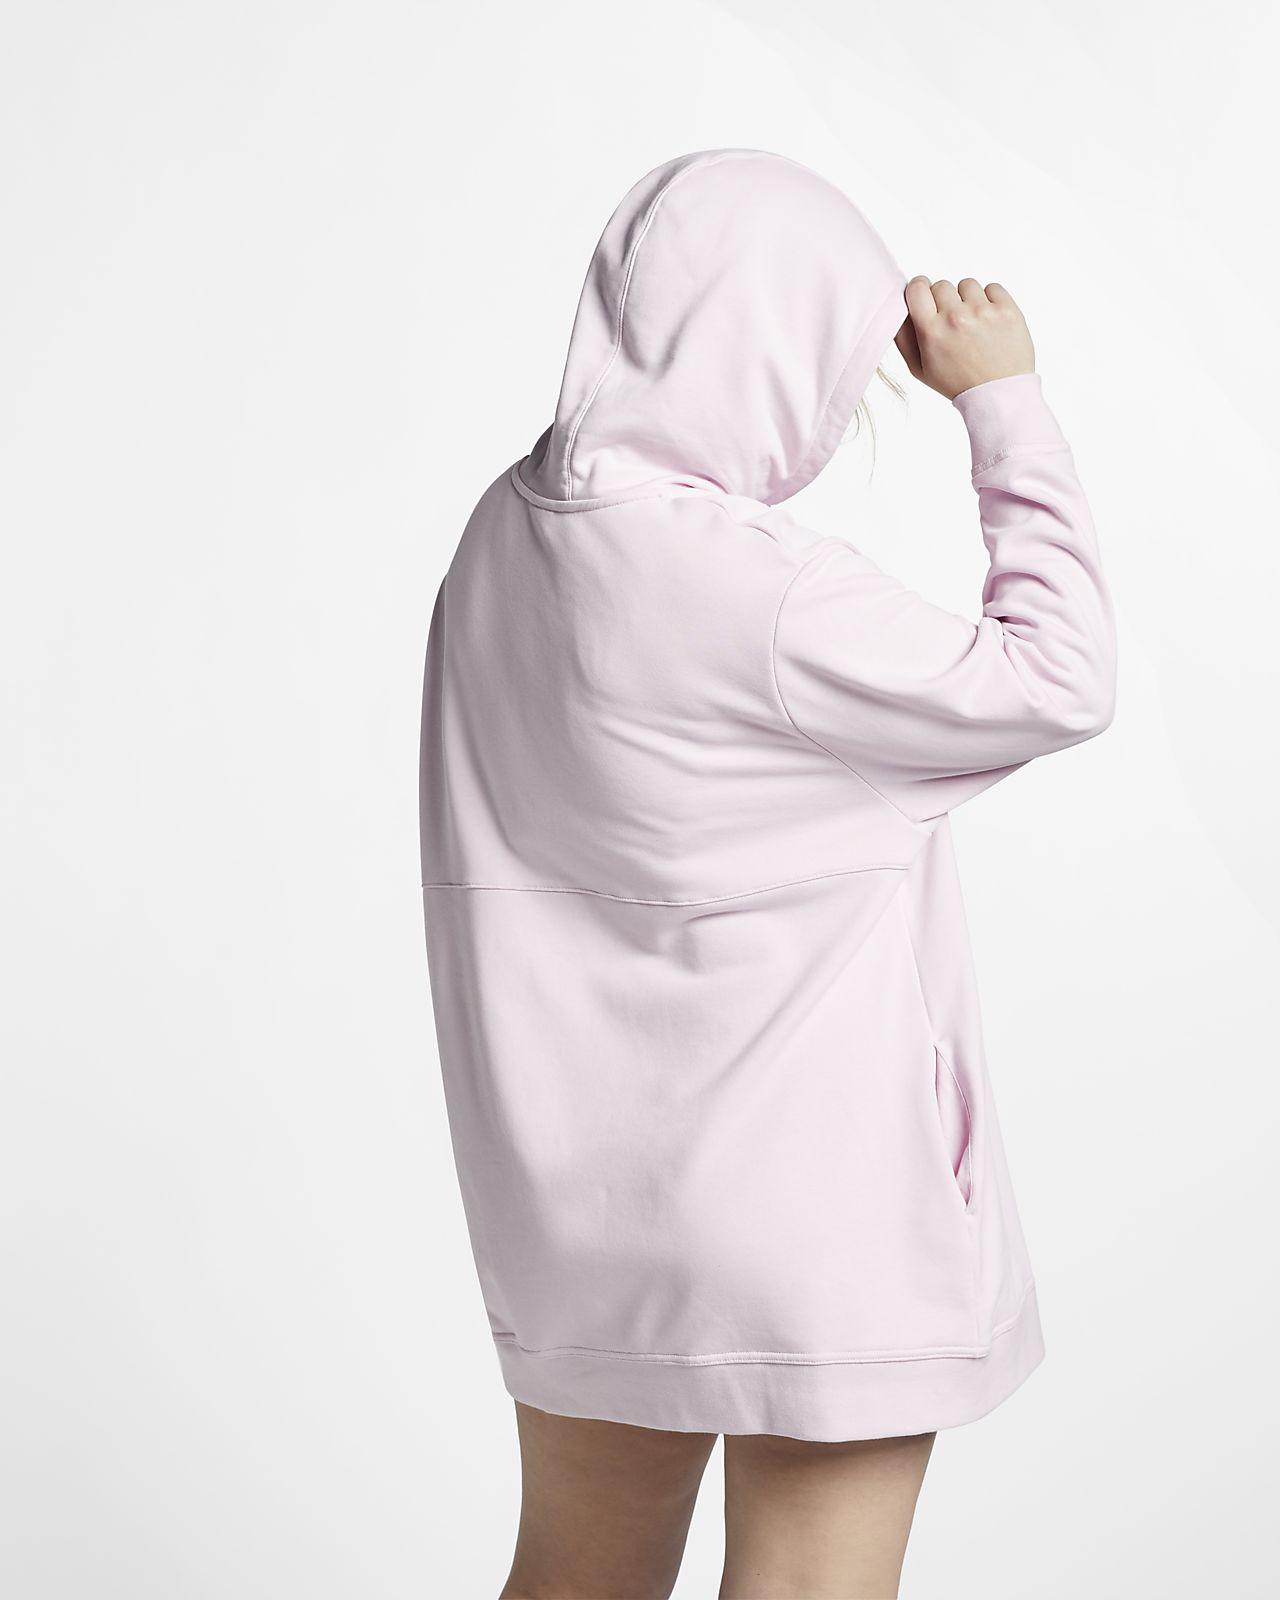 8ef7e966714 Nike Sportswear Swoosh Women s French Terry Dress (Plus Size). Nike ...